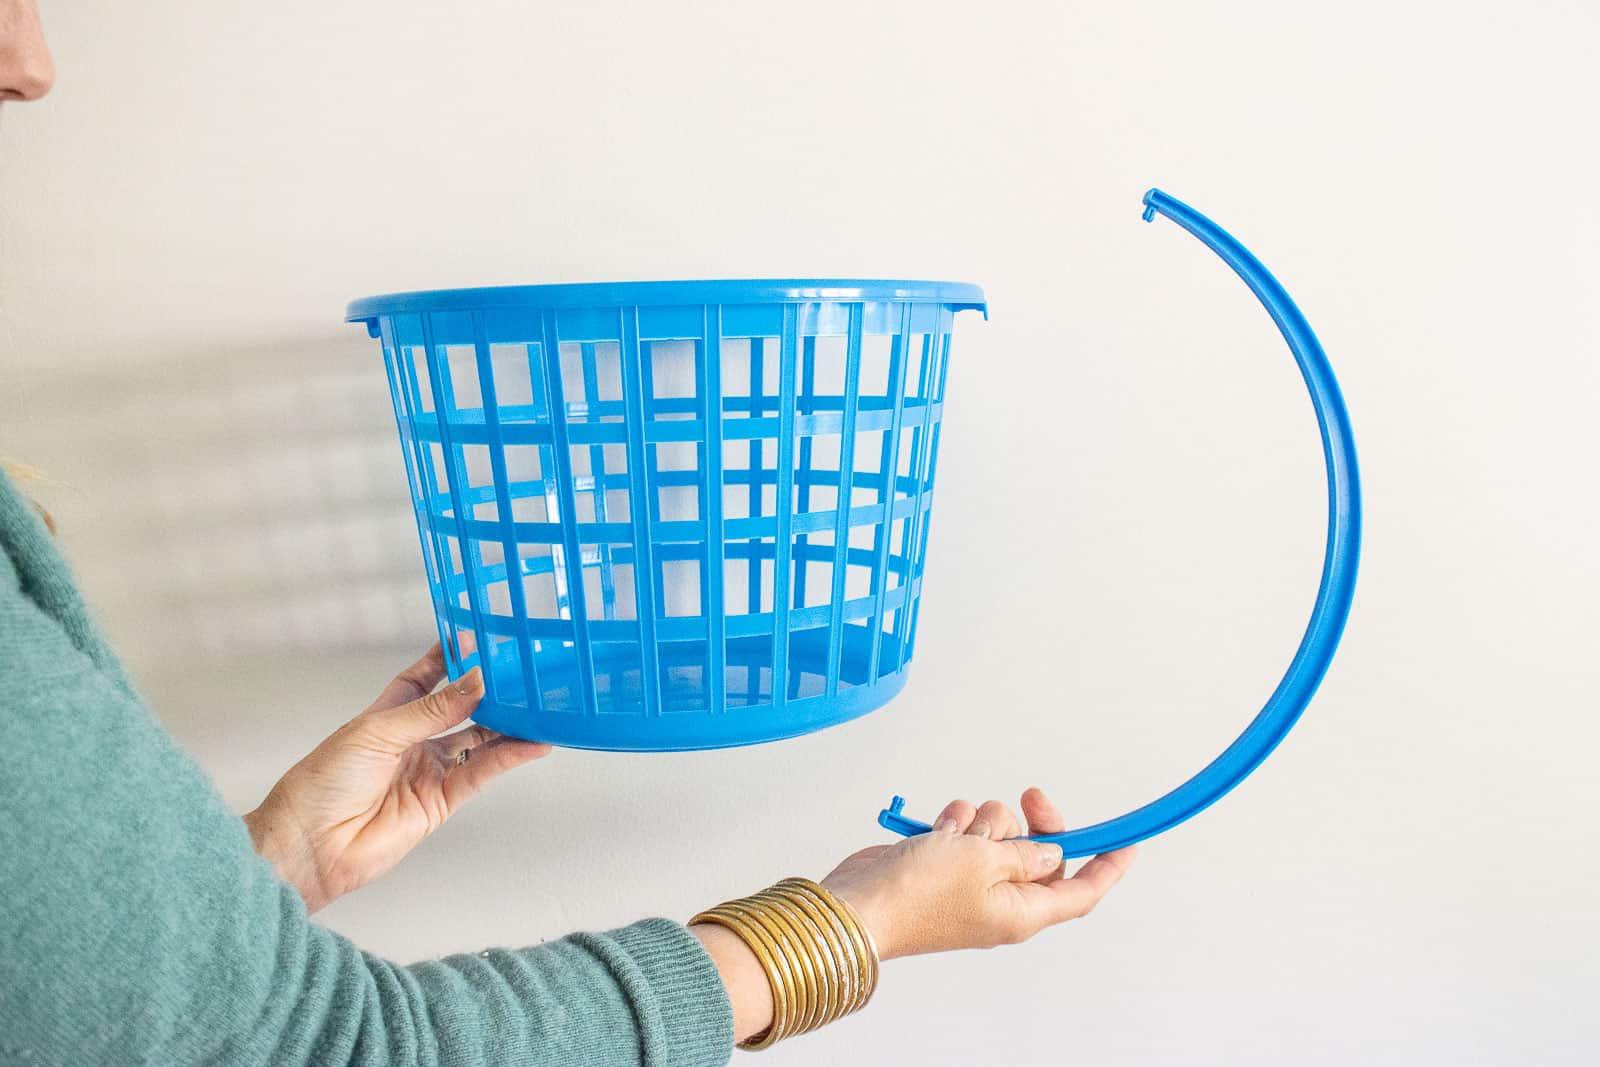 remove handle on the basket